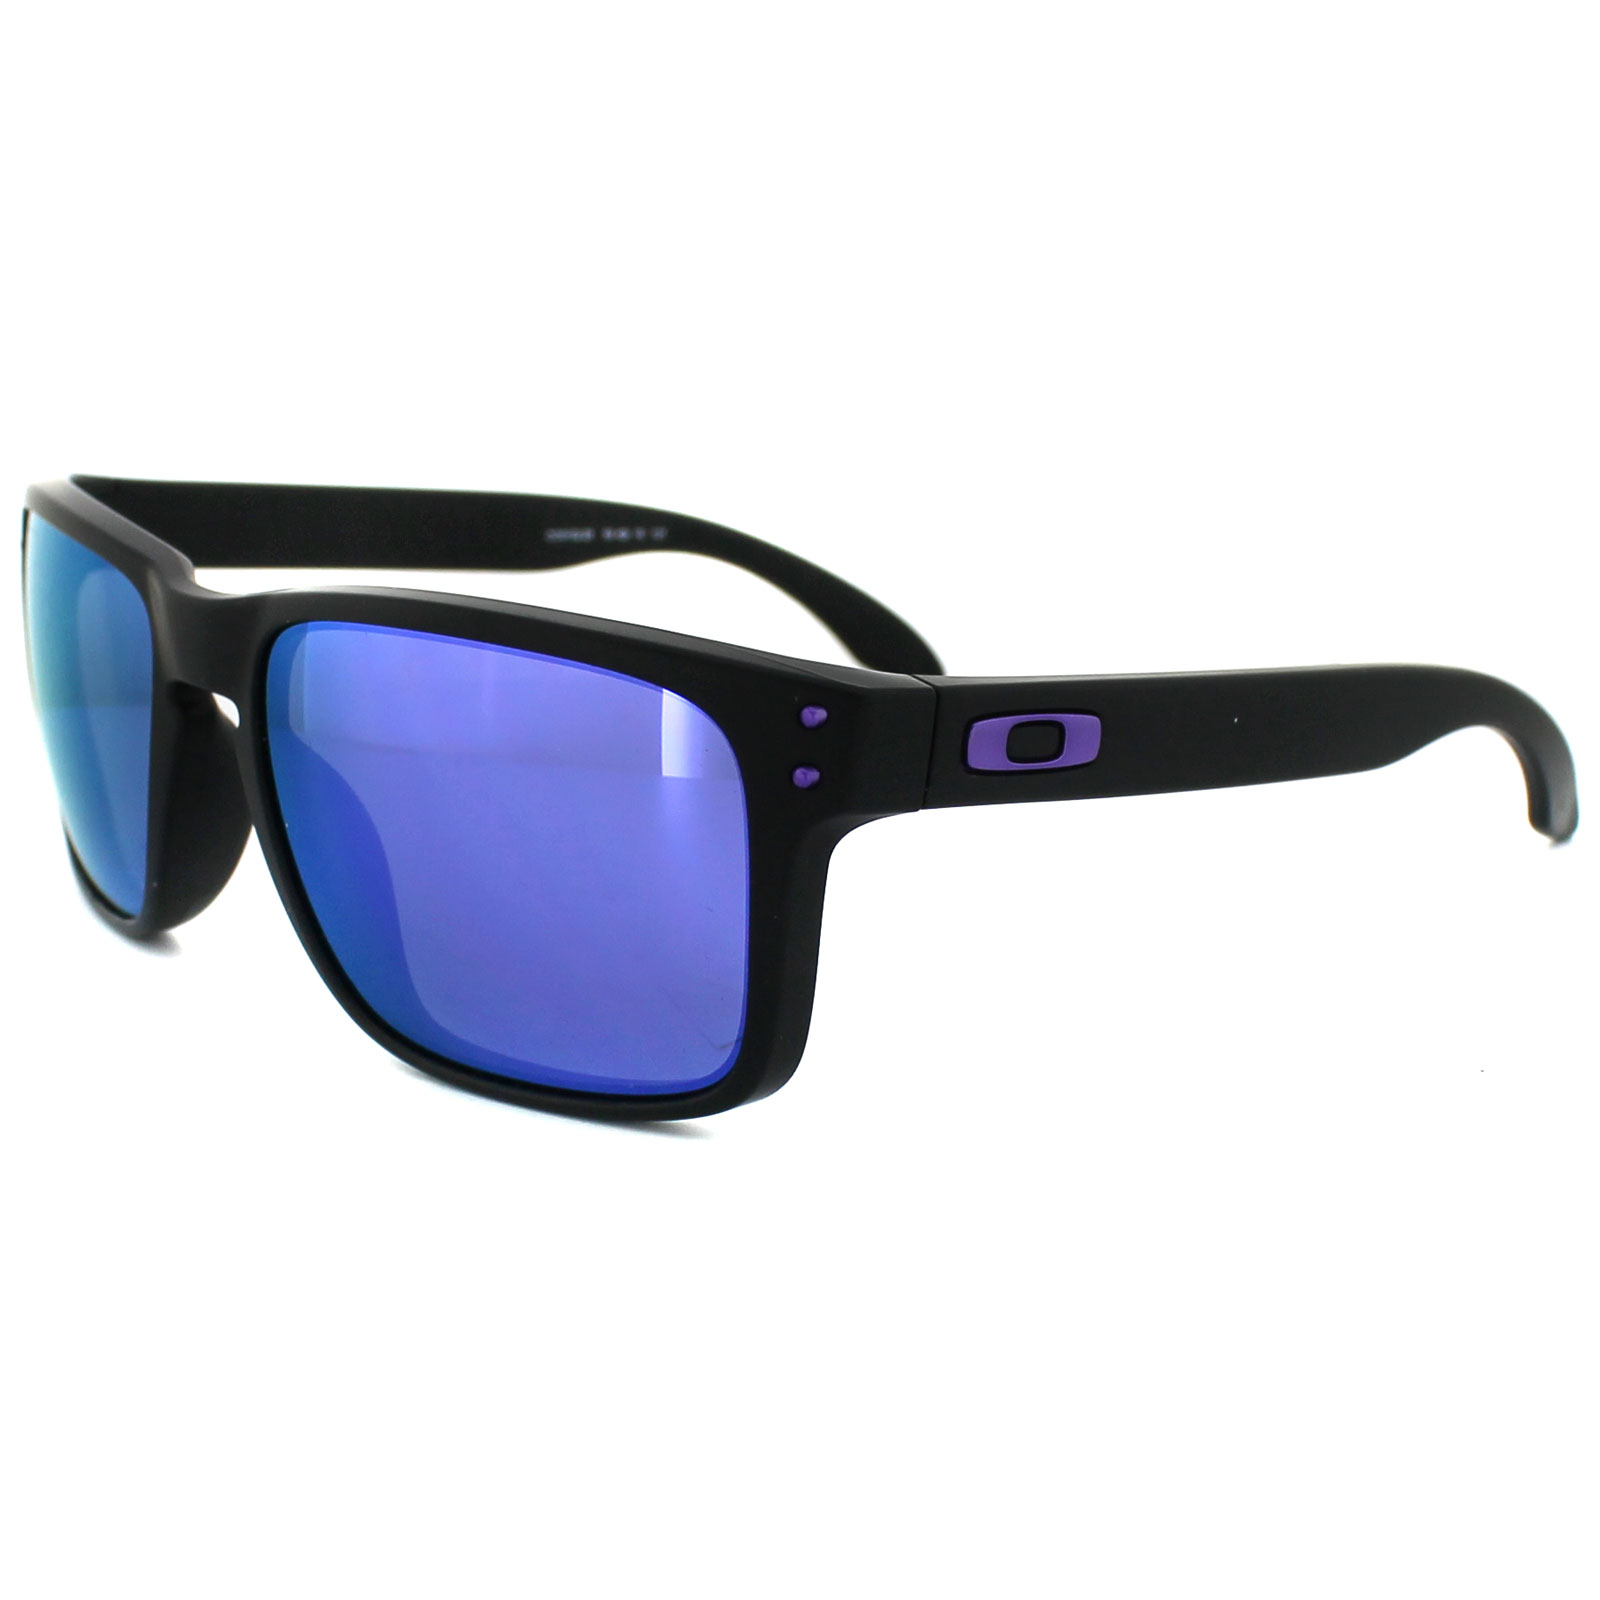 black and purple oakley sunglasses dm3a  black and purple oakley sunglasses